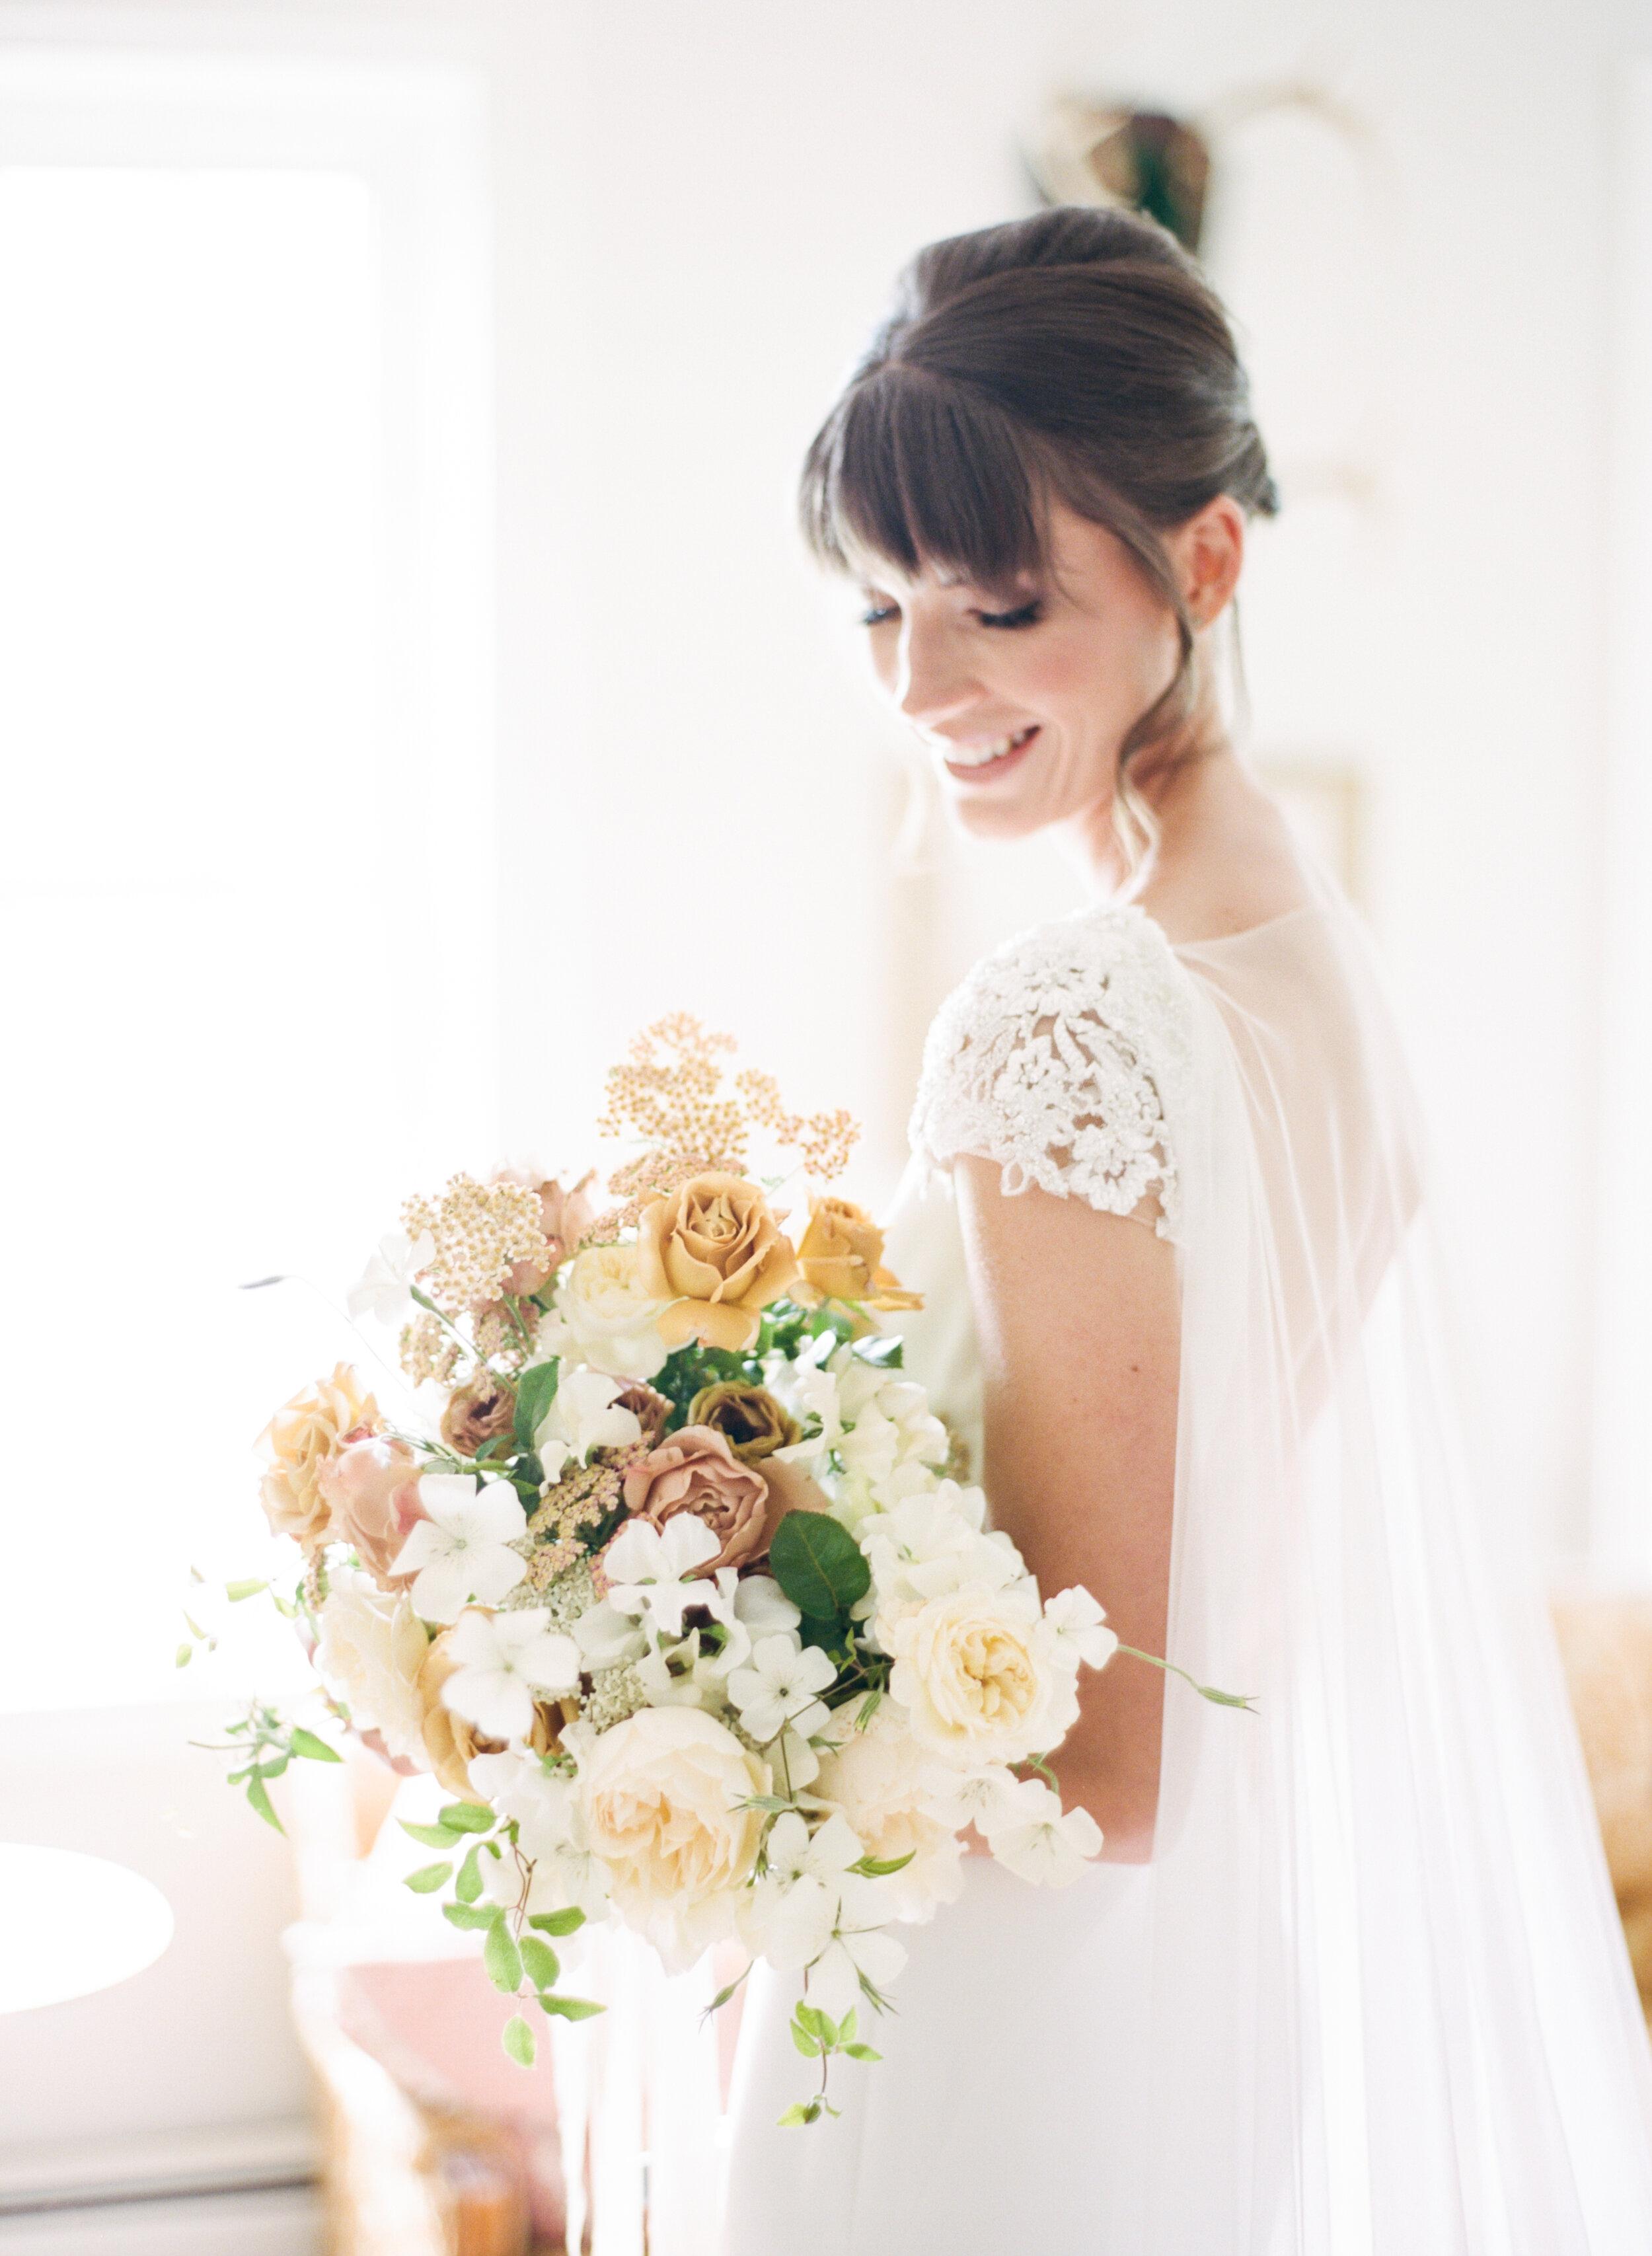 alexandra-meseke-understated-soft-luxury-wedding-upstate-ny_0047.jpg